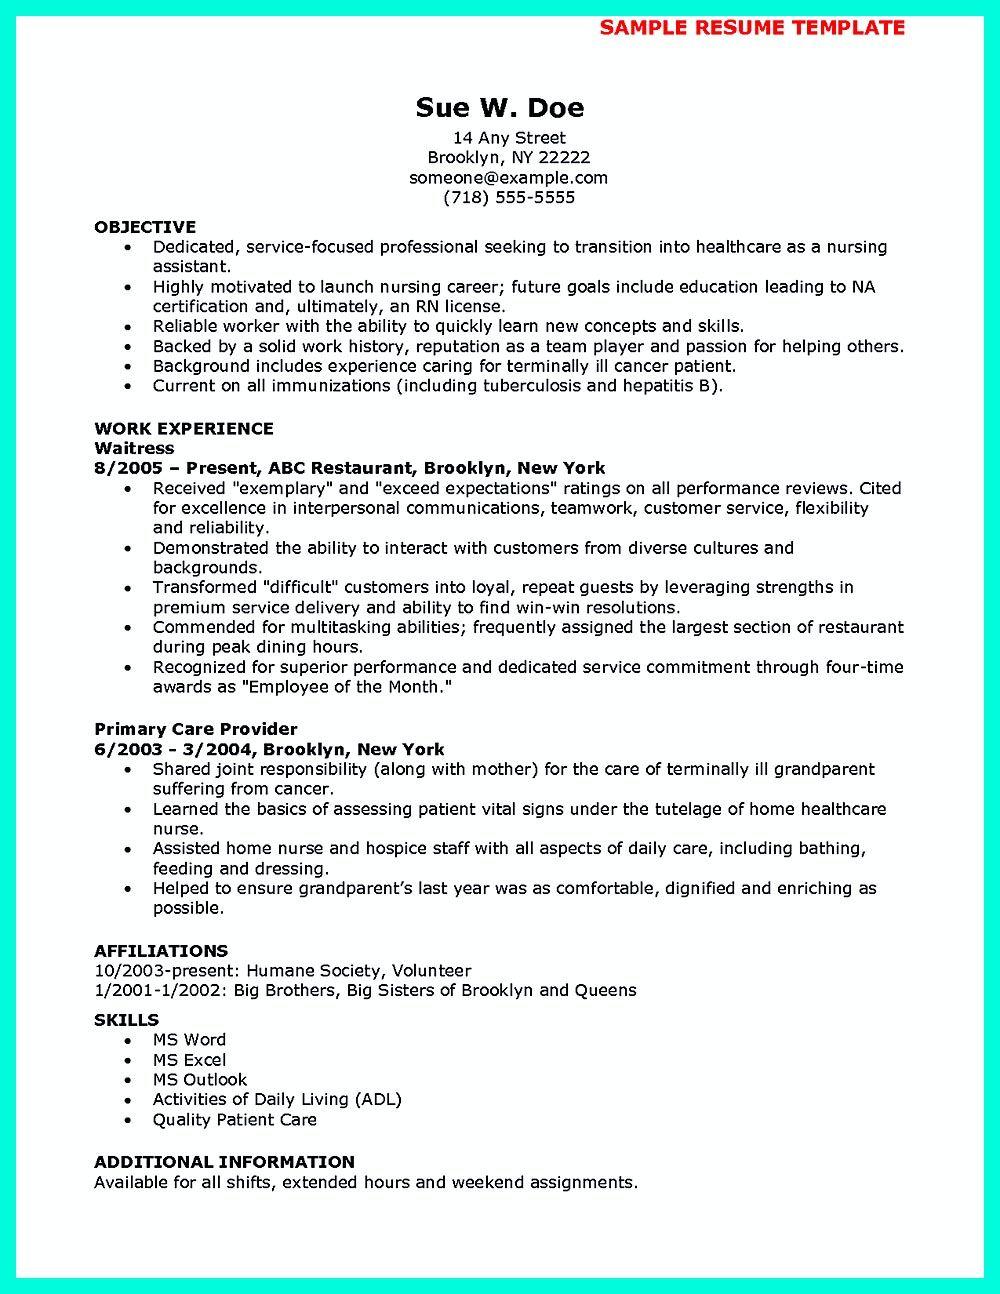 Pin On Resume Sample Template And Format Nursing Resume